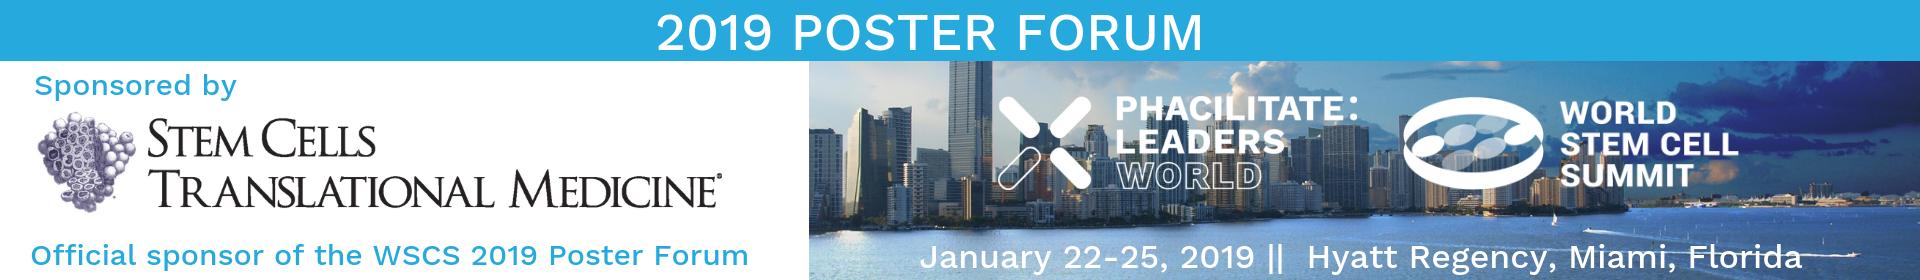 World Stem Cell Summit 2019 Event Banner